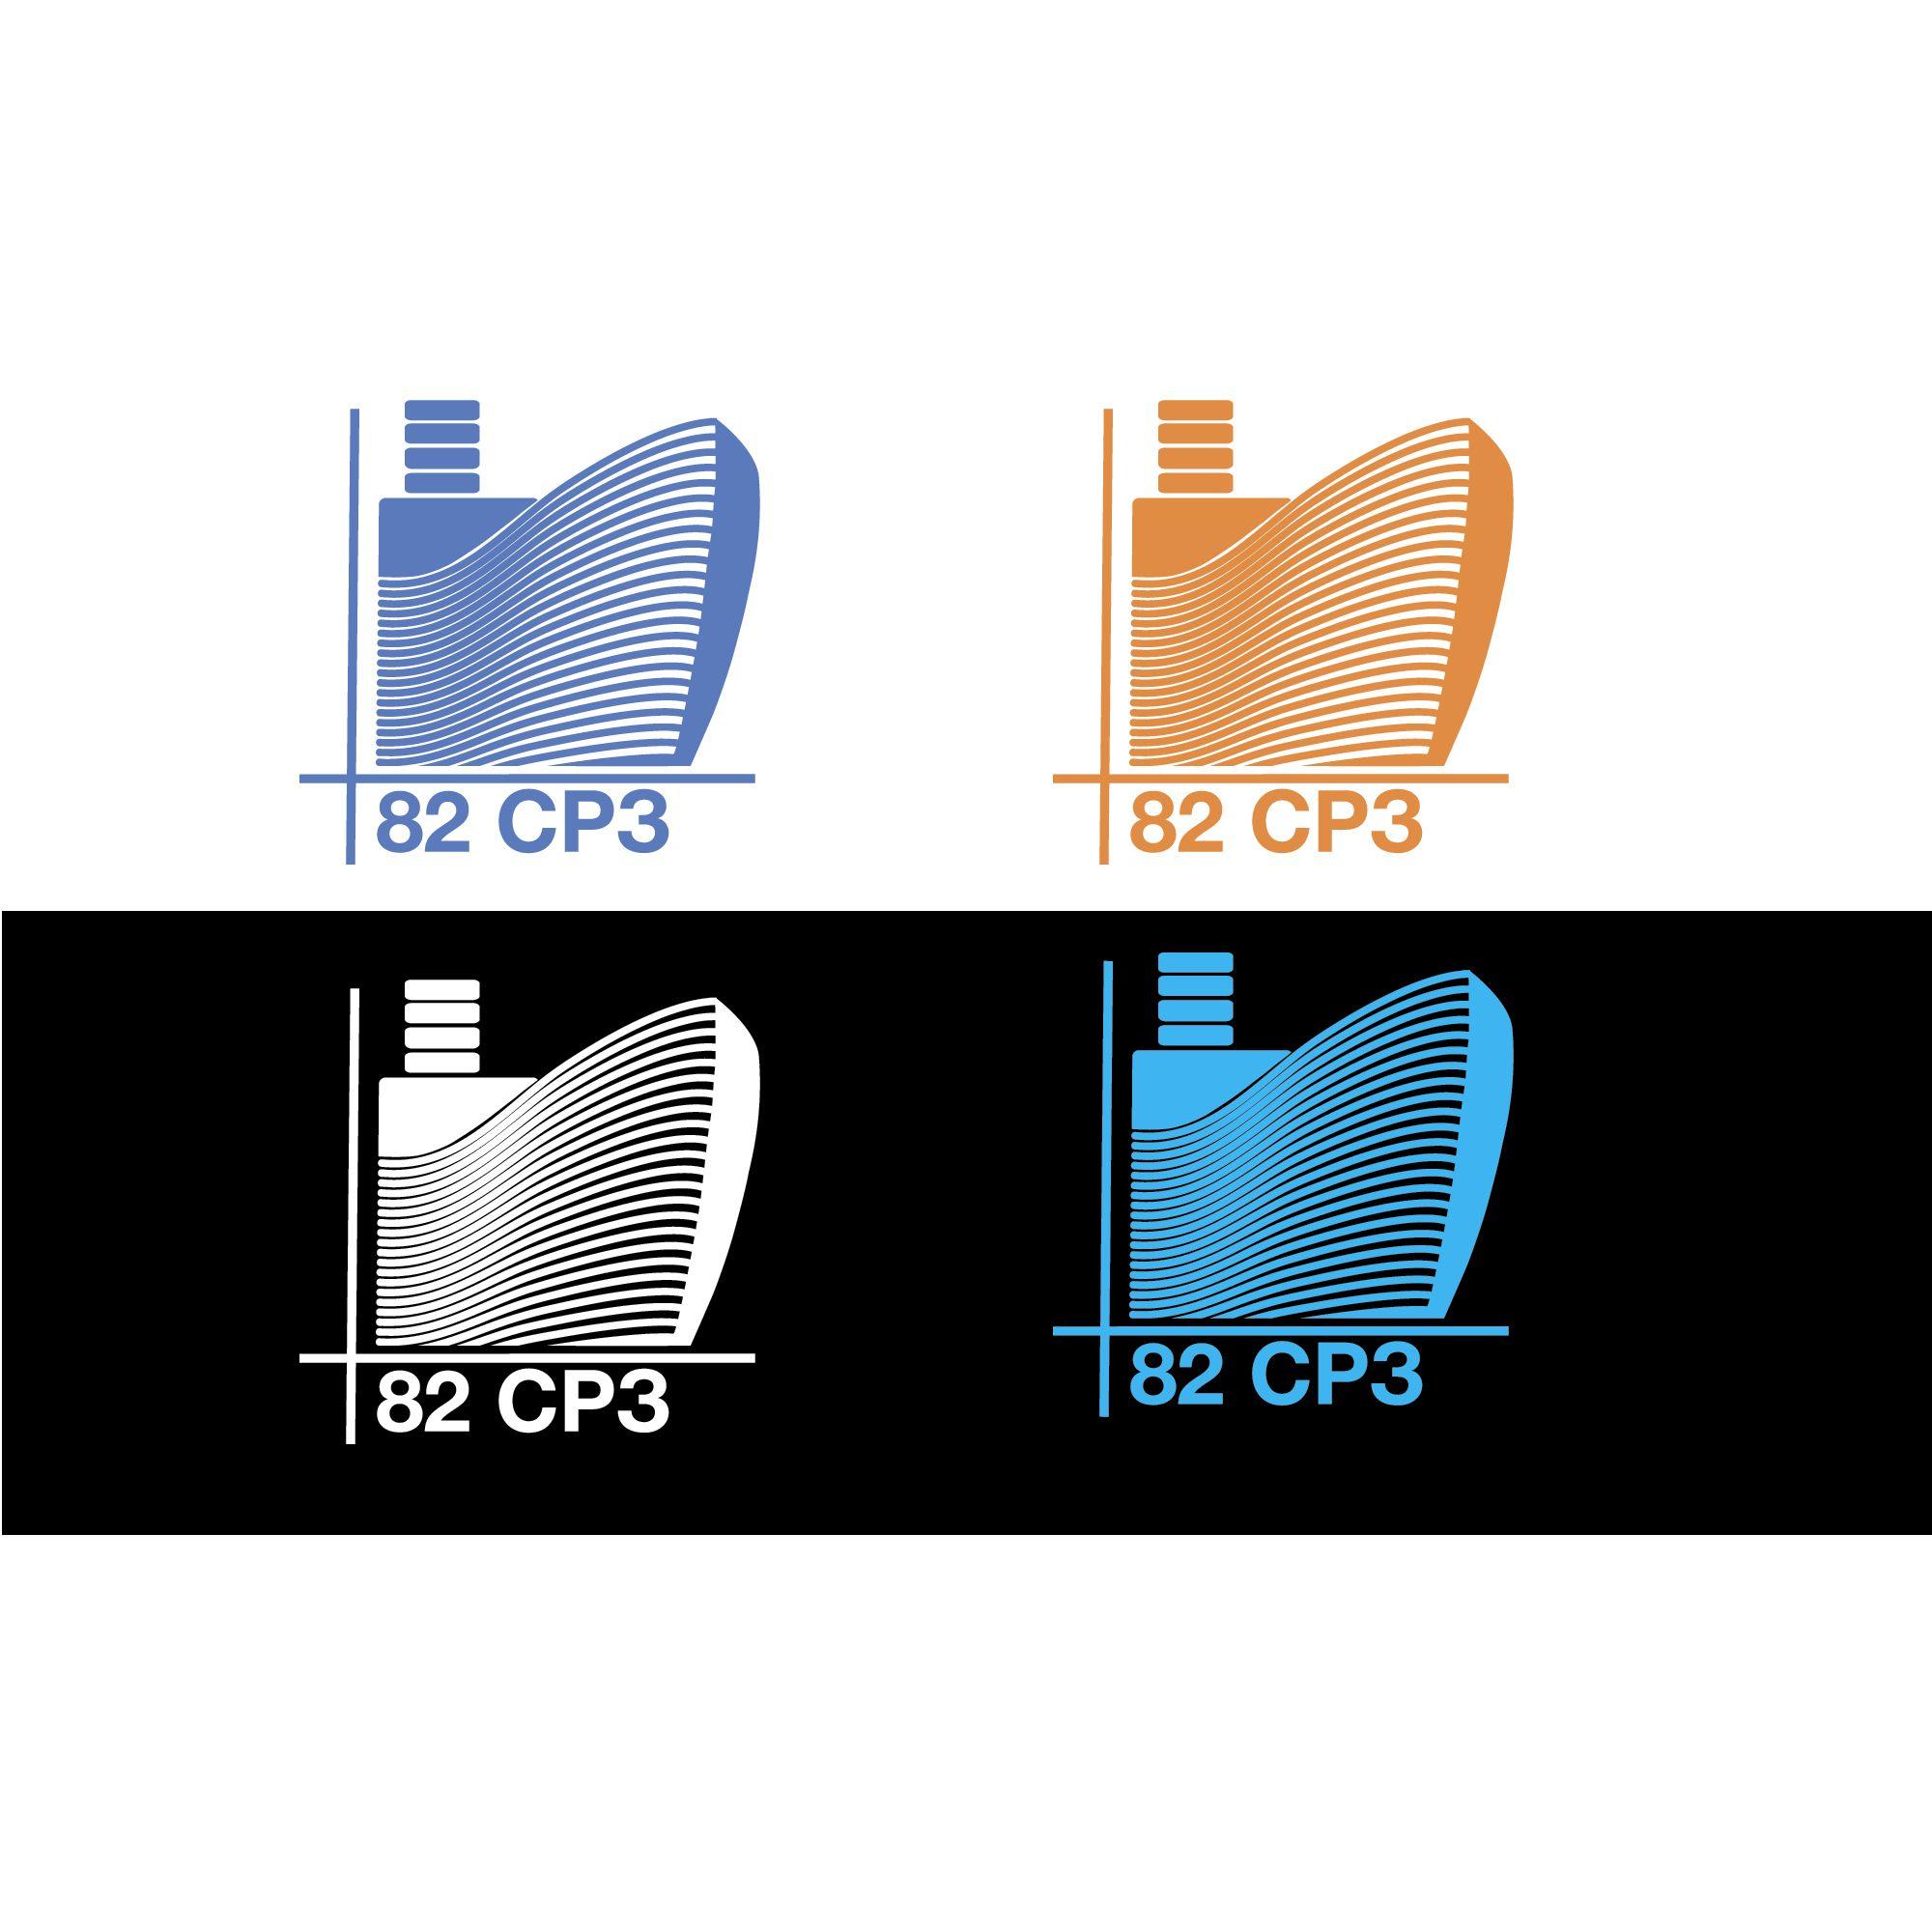 Логотип для судоремонтного завода - дизайнер atmannn